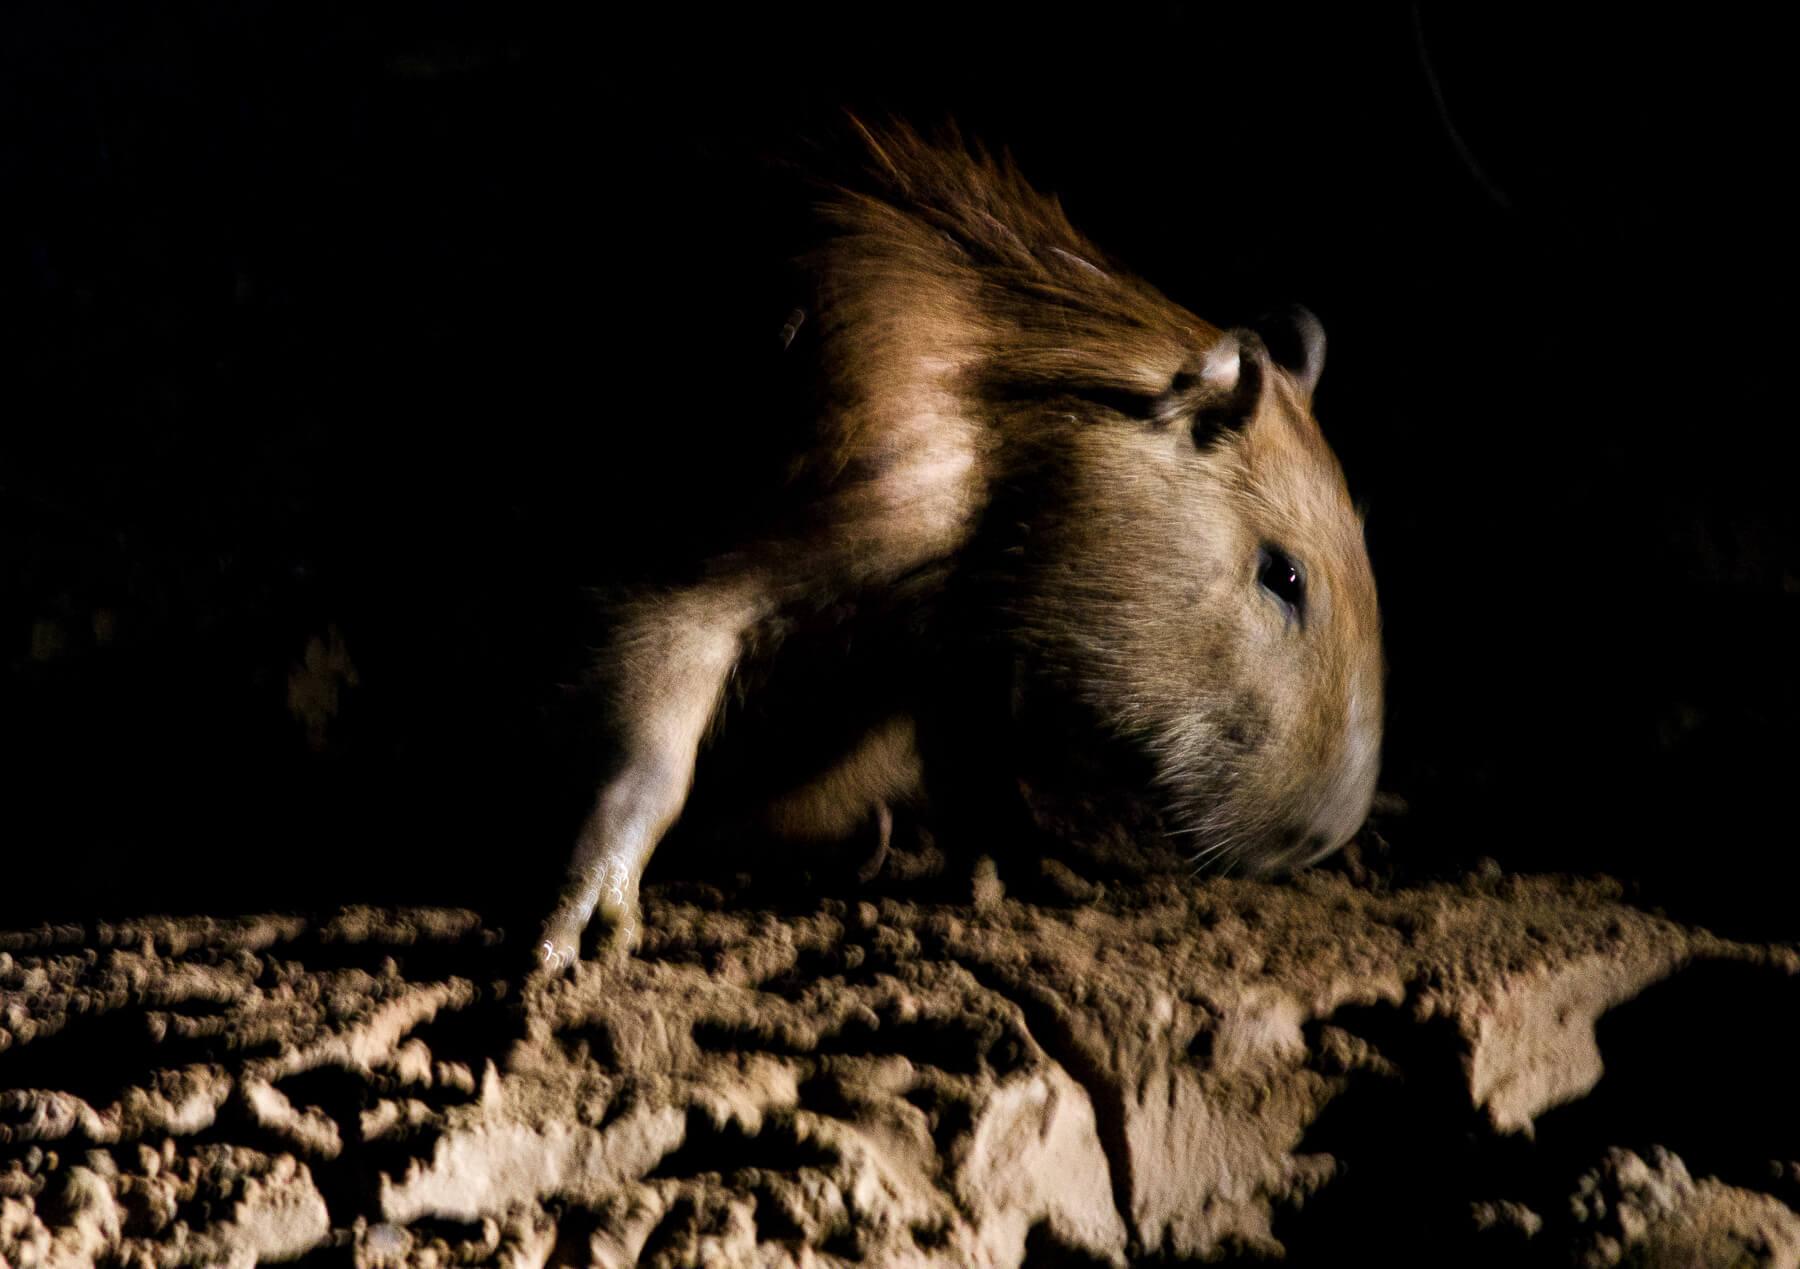 Capybara sniffing ground during night in Amazon